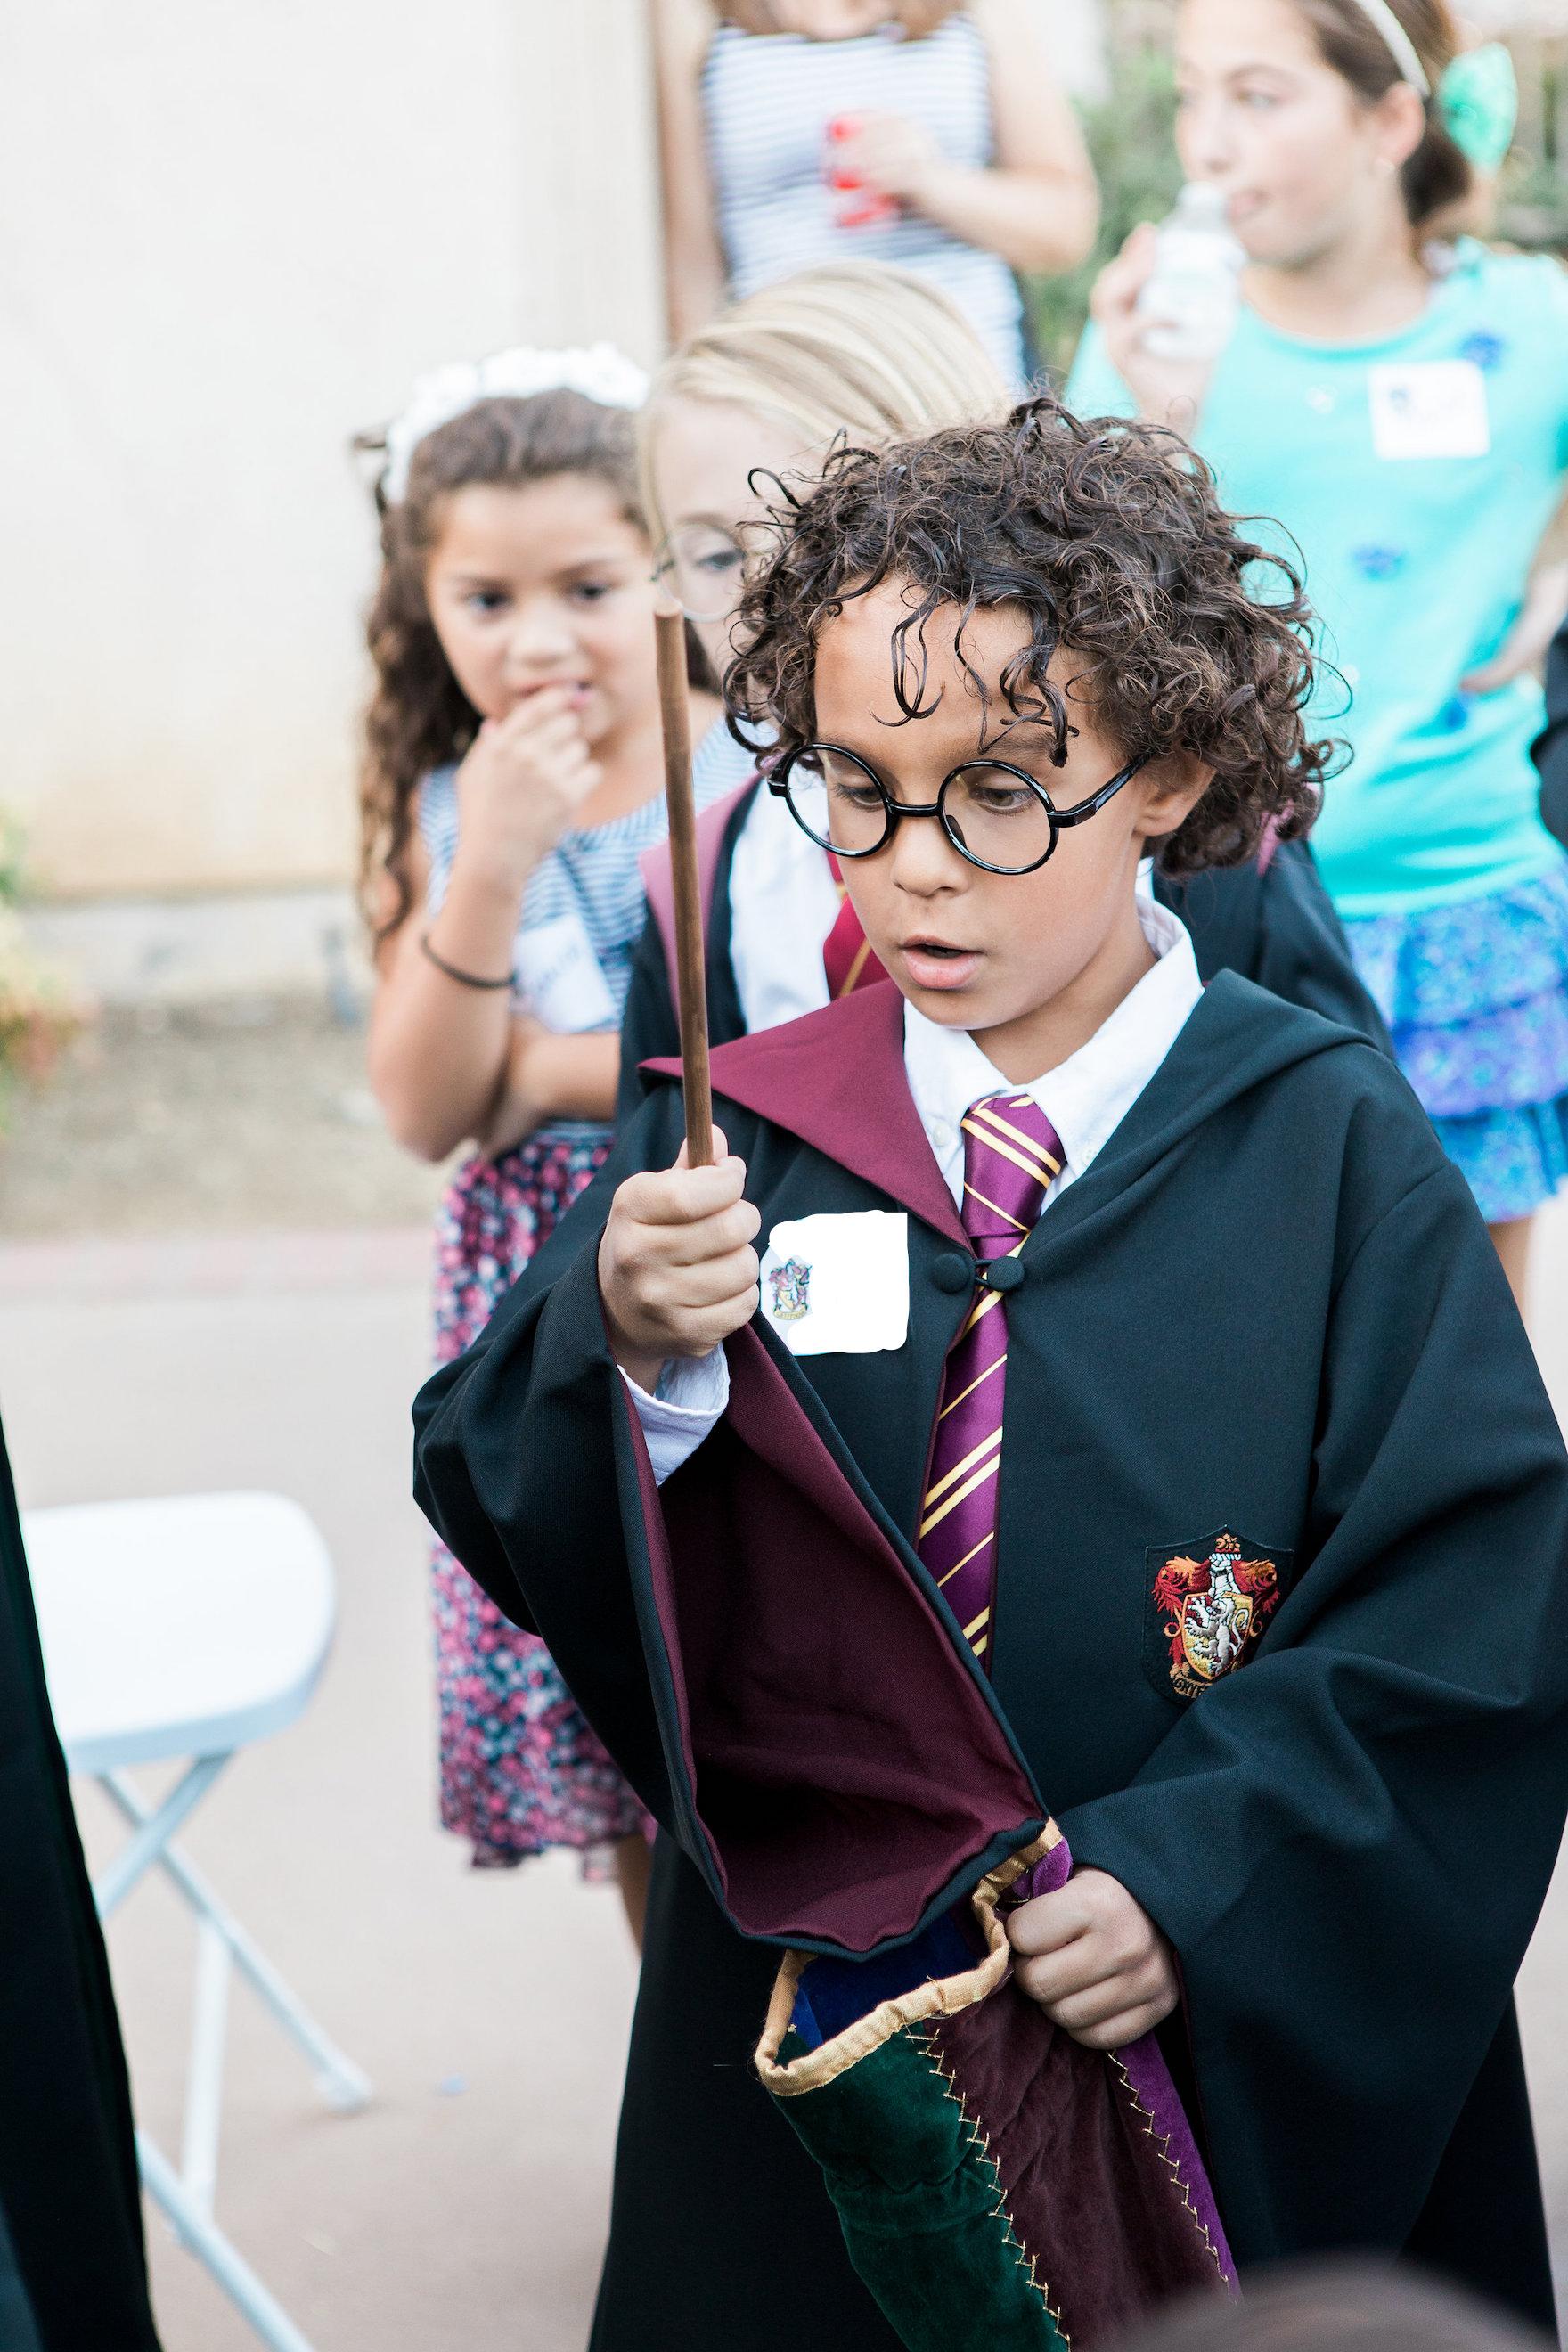 Hogwarts Wand Selection Harry Potter Birthday Party LA